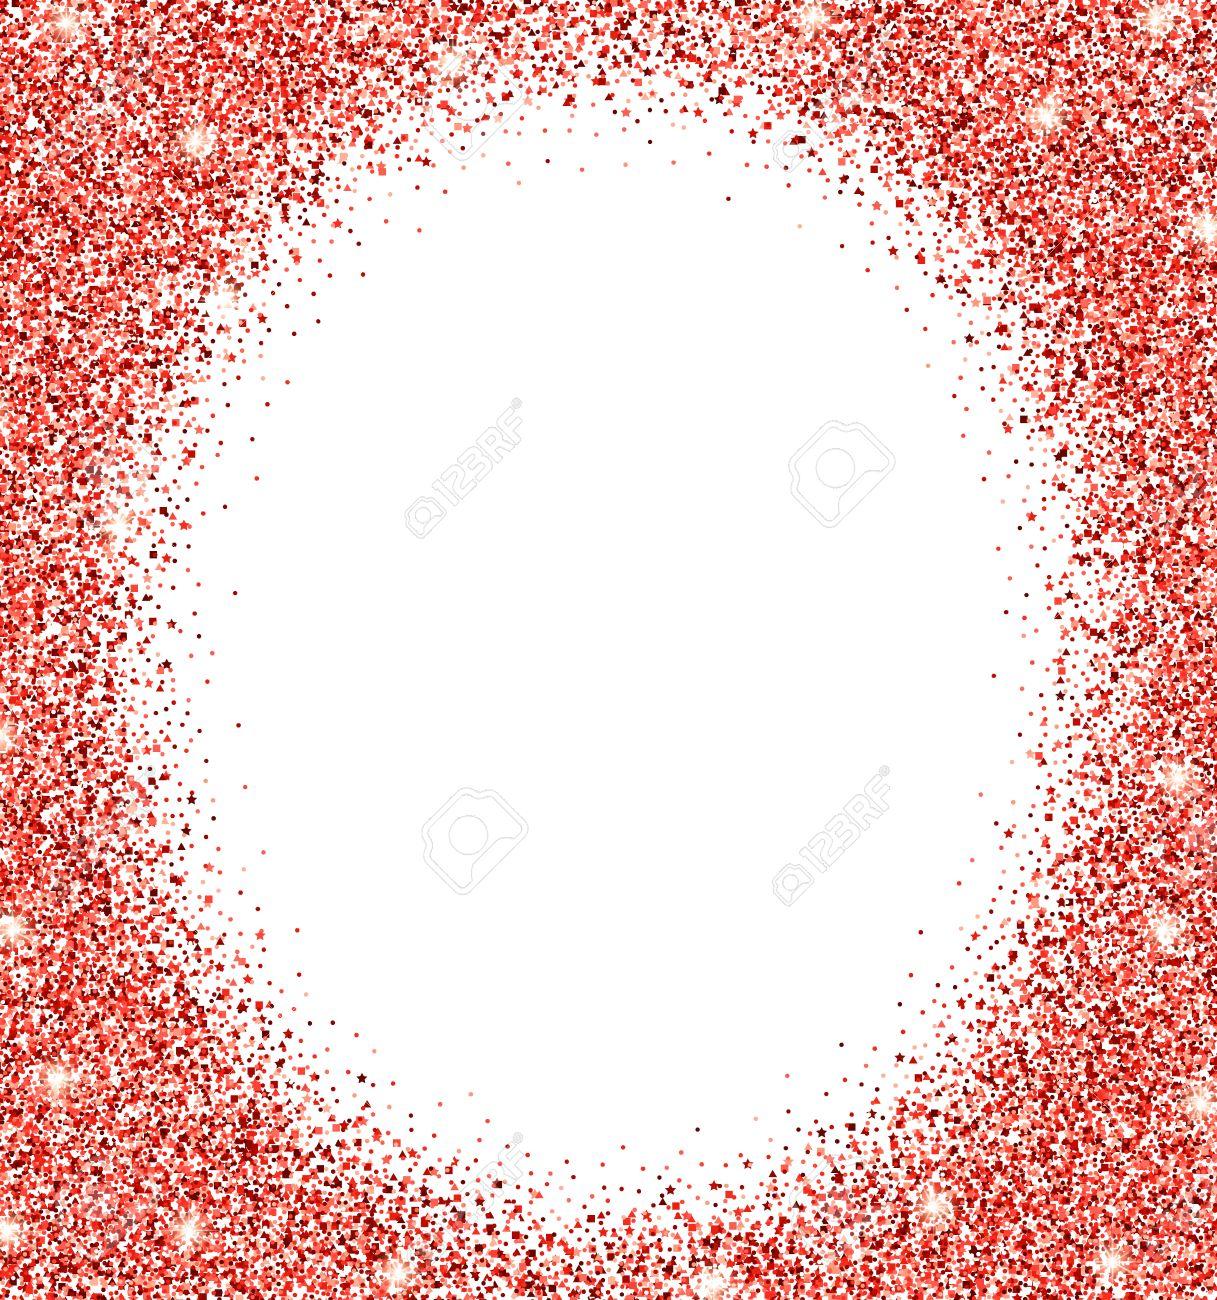 red glitter background red sparkle round frame template for red glitter background red sparkle round frame template for holiday designs invitation